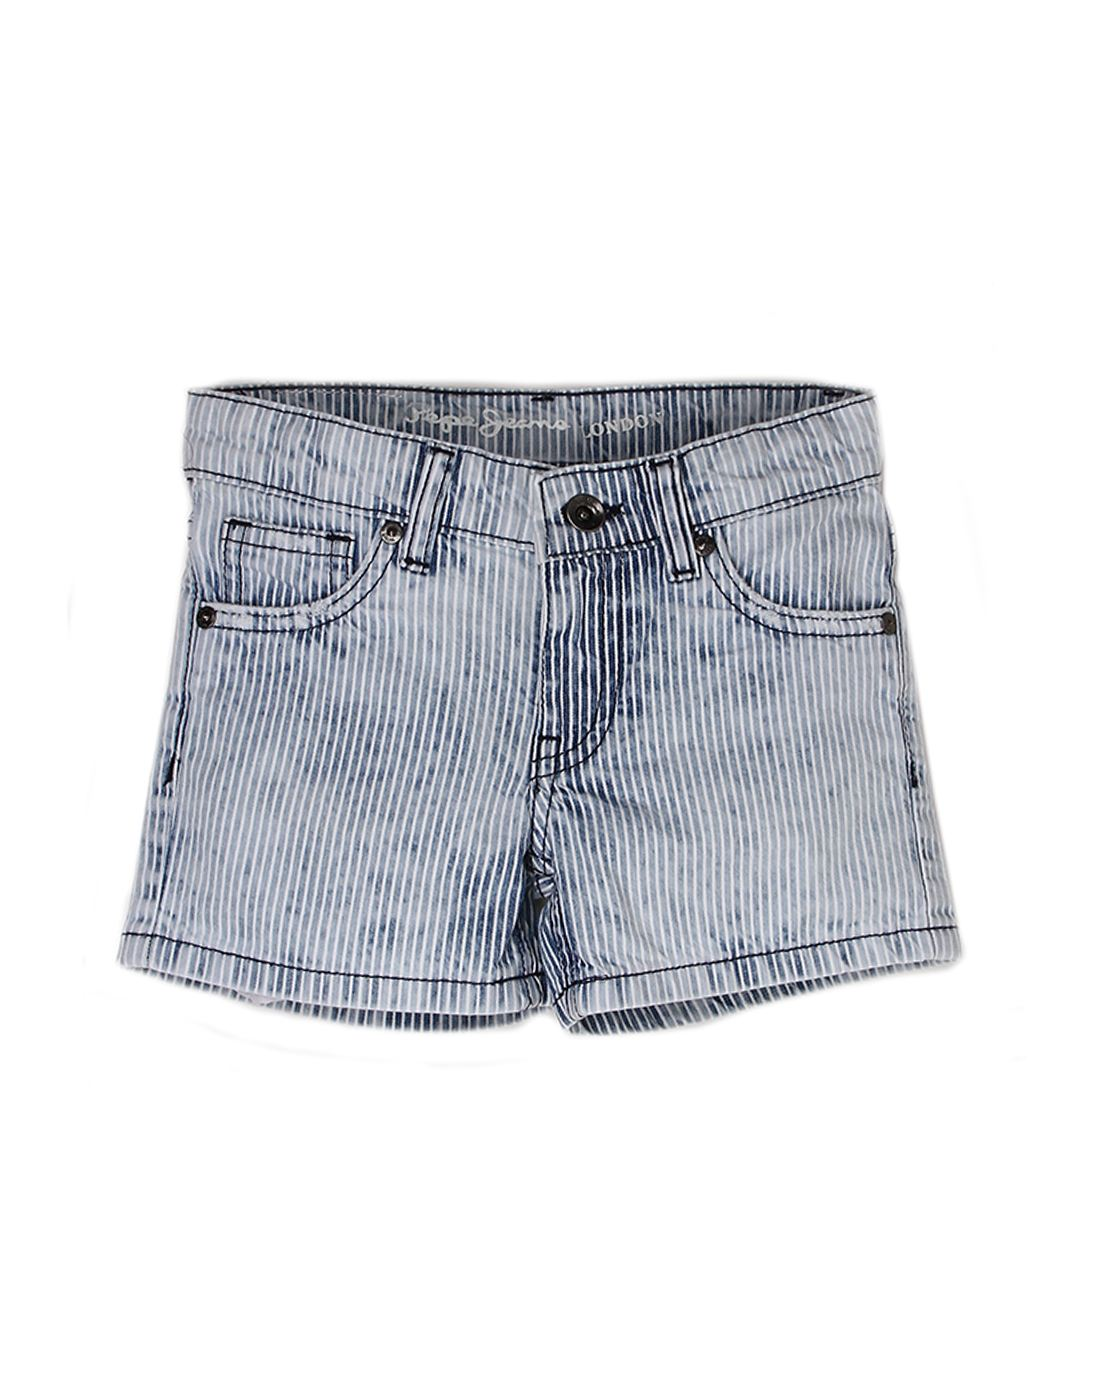 Pepe Jeans Girls Cotton Short